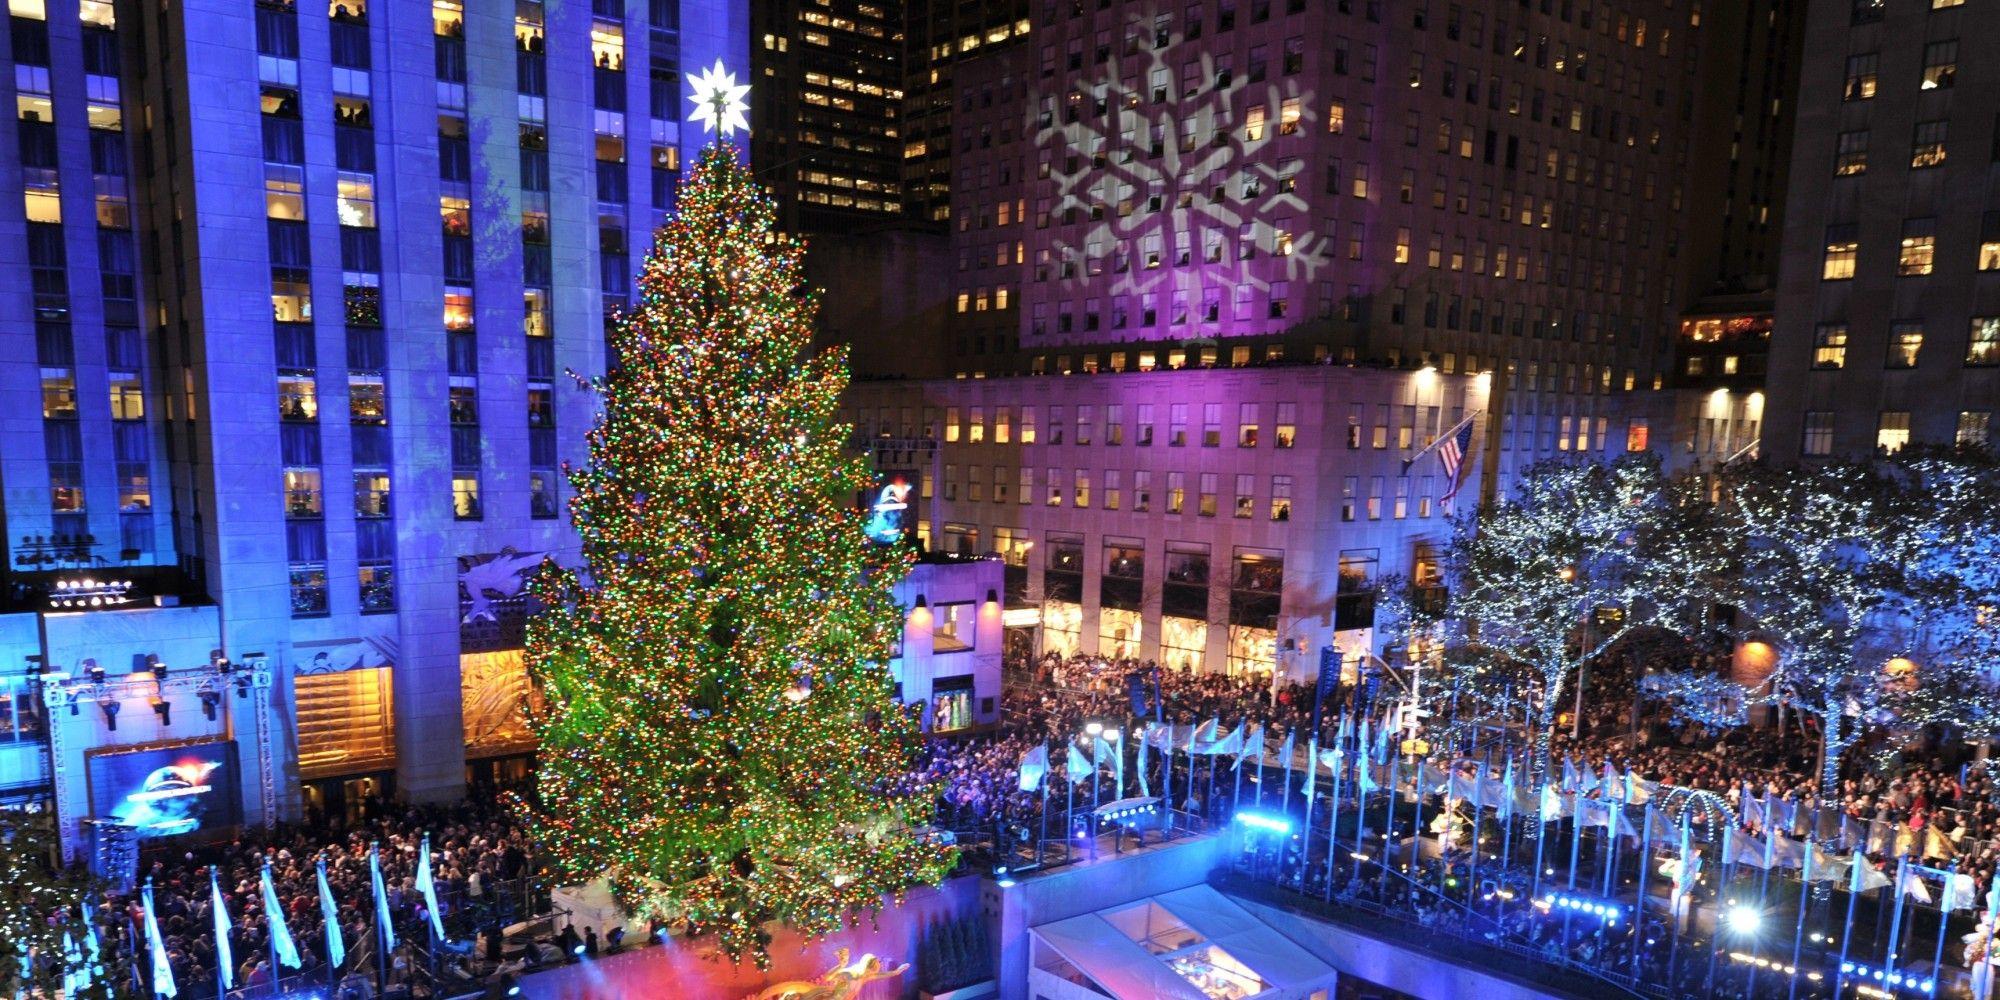 Albero Di Natale New York.Us Culture Christmas Rockefeller Tree Luci Di Natale New York Natale Decorazioni Di Natale